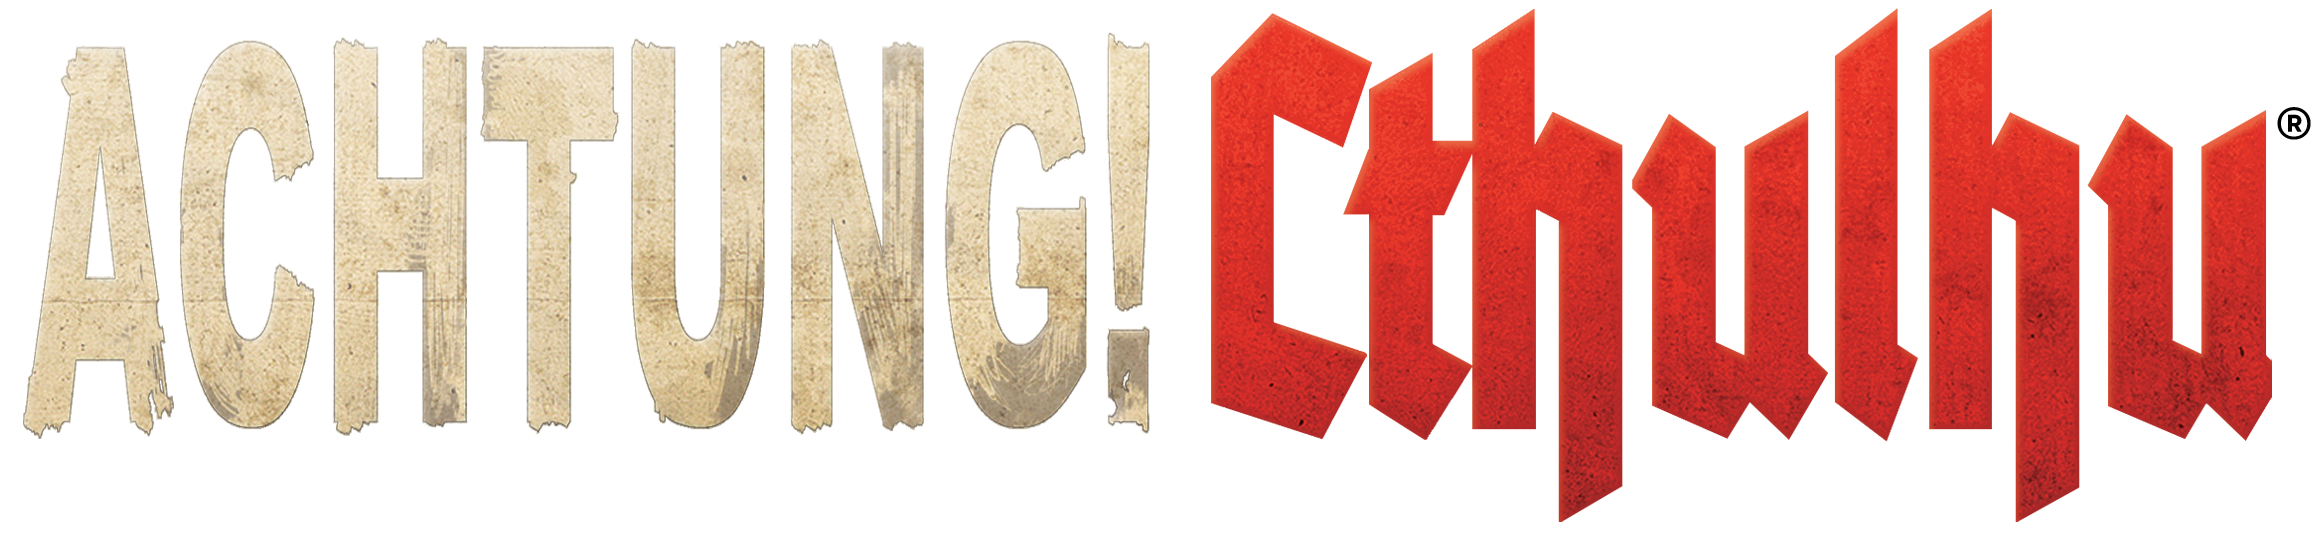 Achtung Cthulhu logo